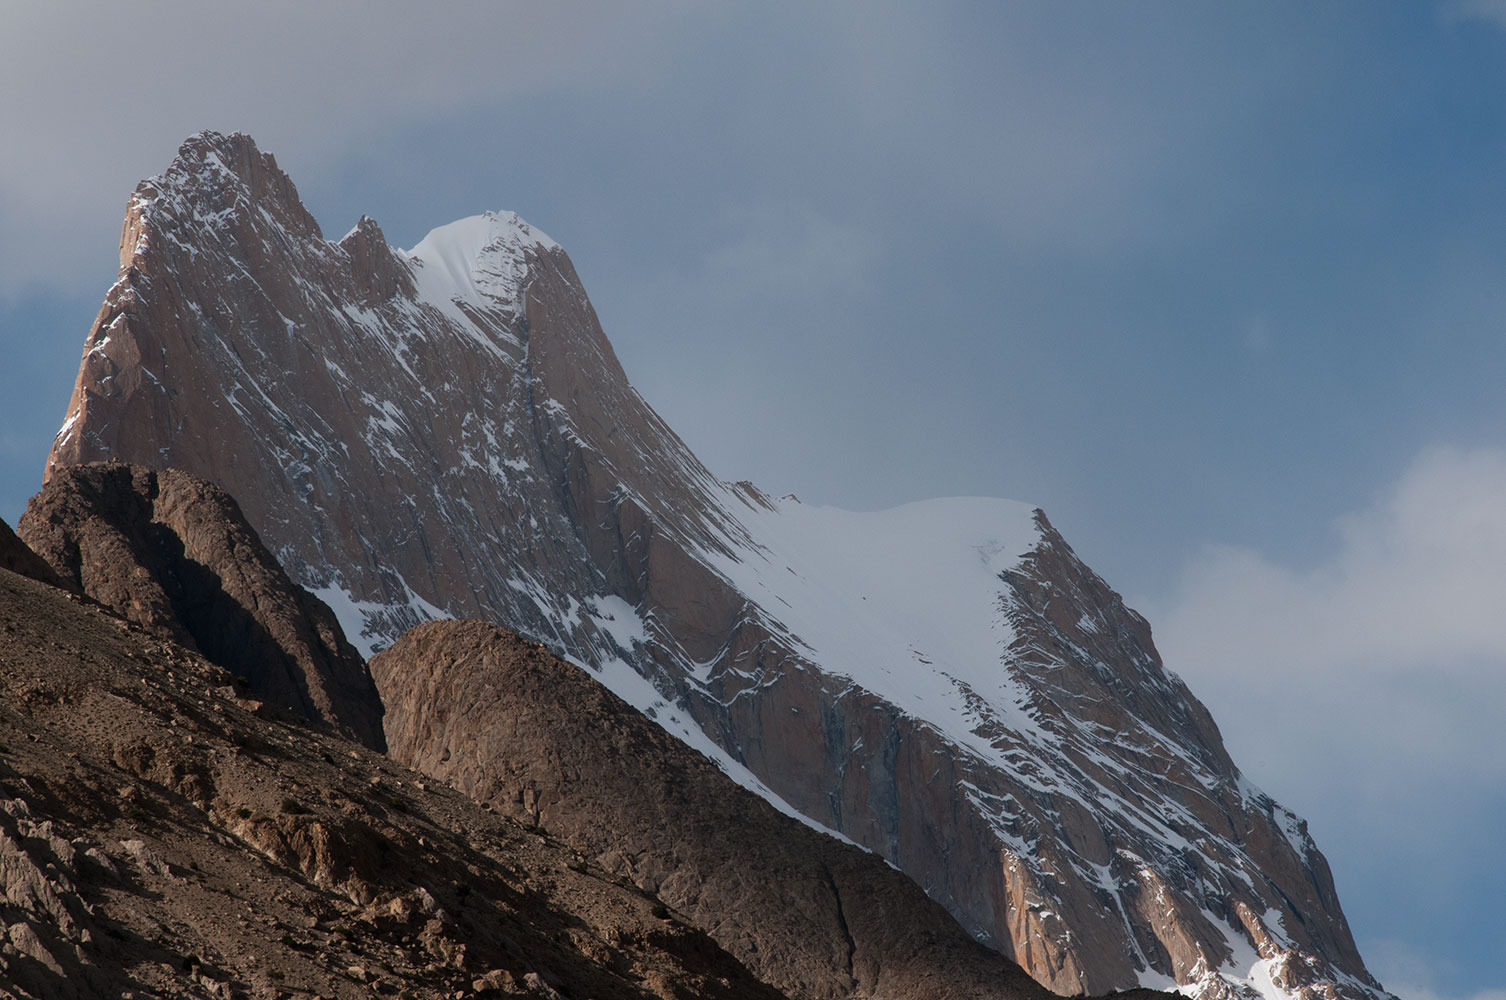 The summit peering over an intervening ridge, from Paiju in the Braldu valleyNikon D300, 180mm